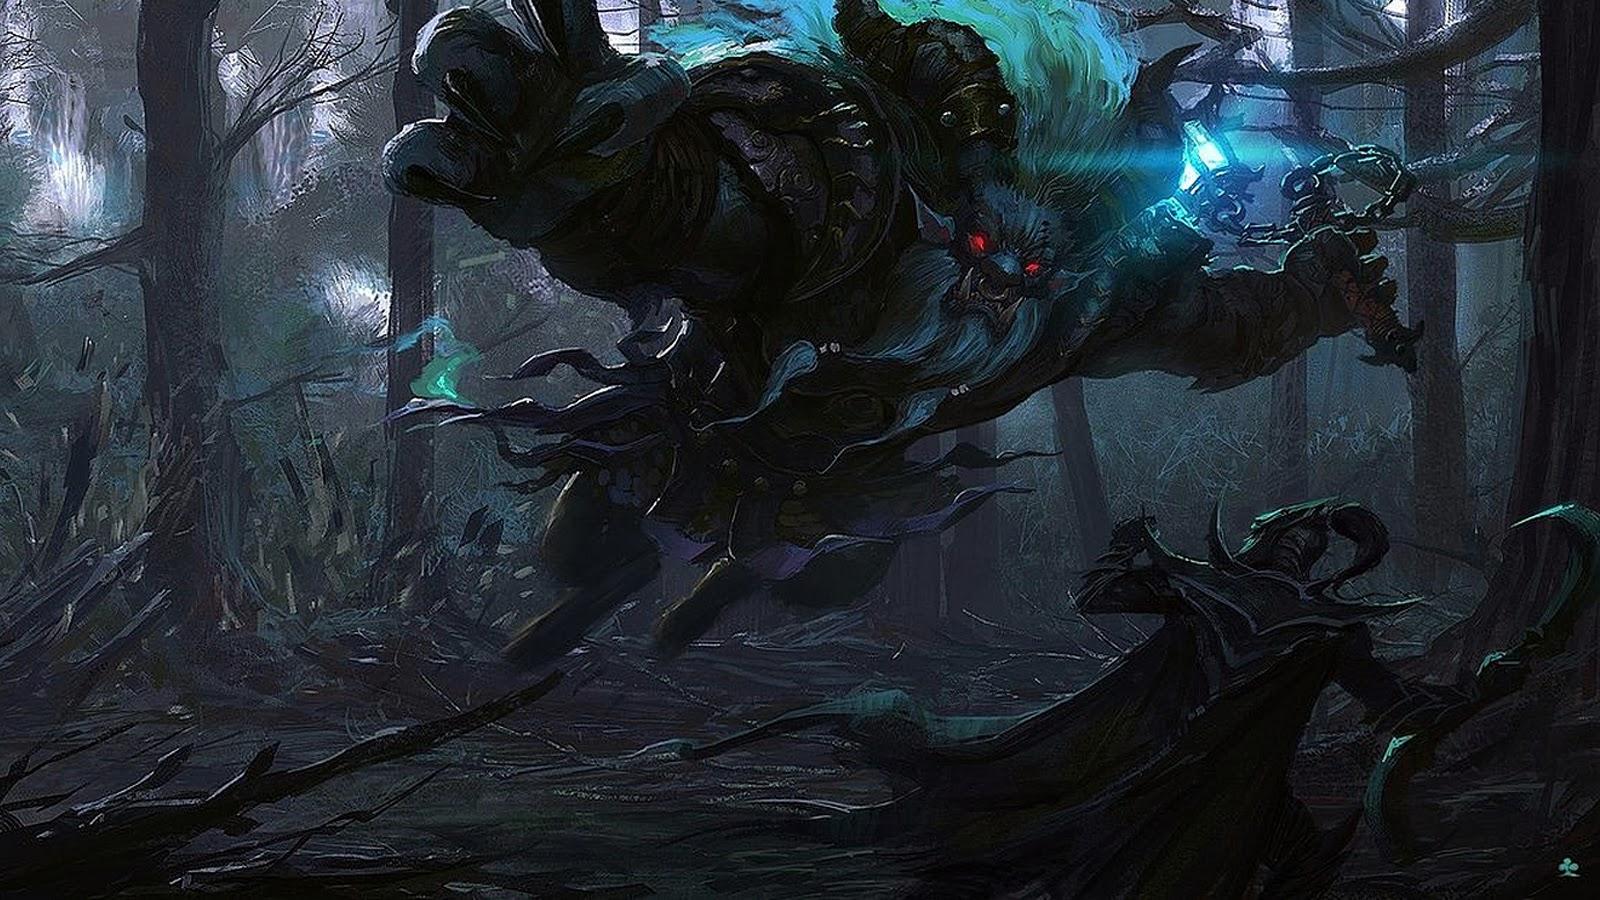 vs mortred phantom assassin dota 2 hero hd wallpaper 1600x900 u8 1600x900